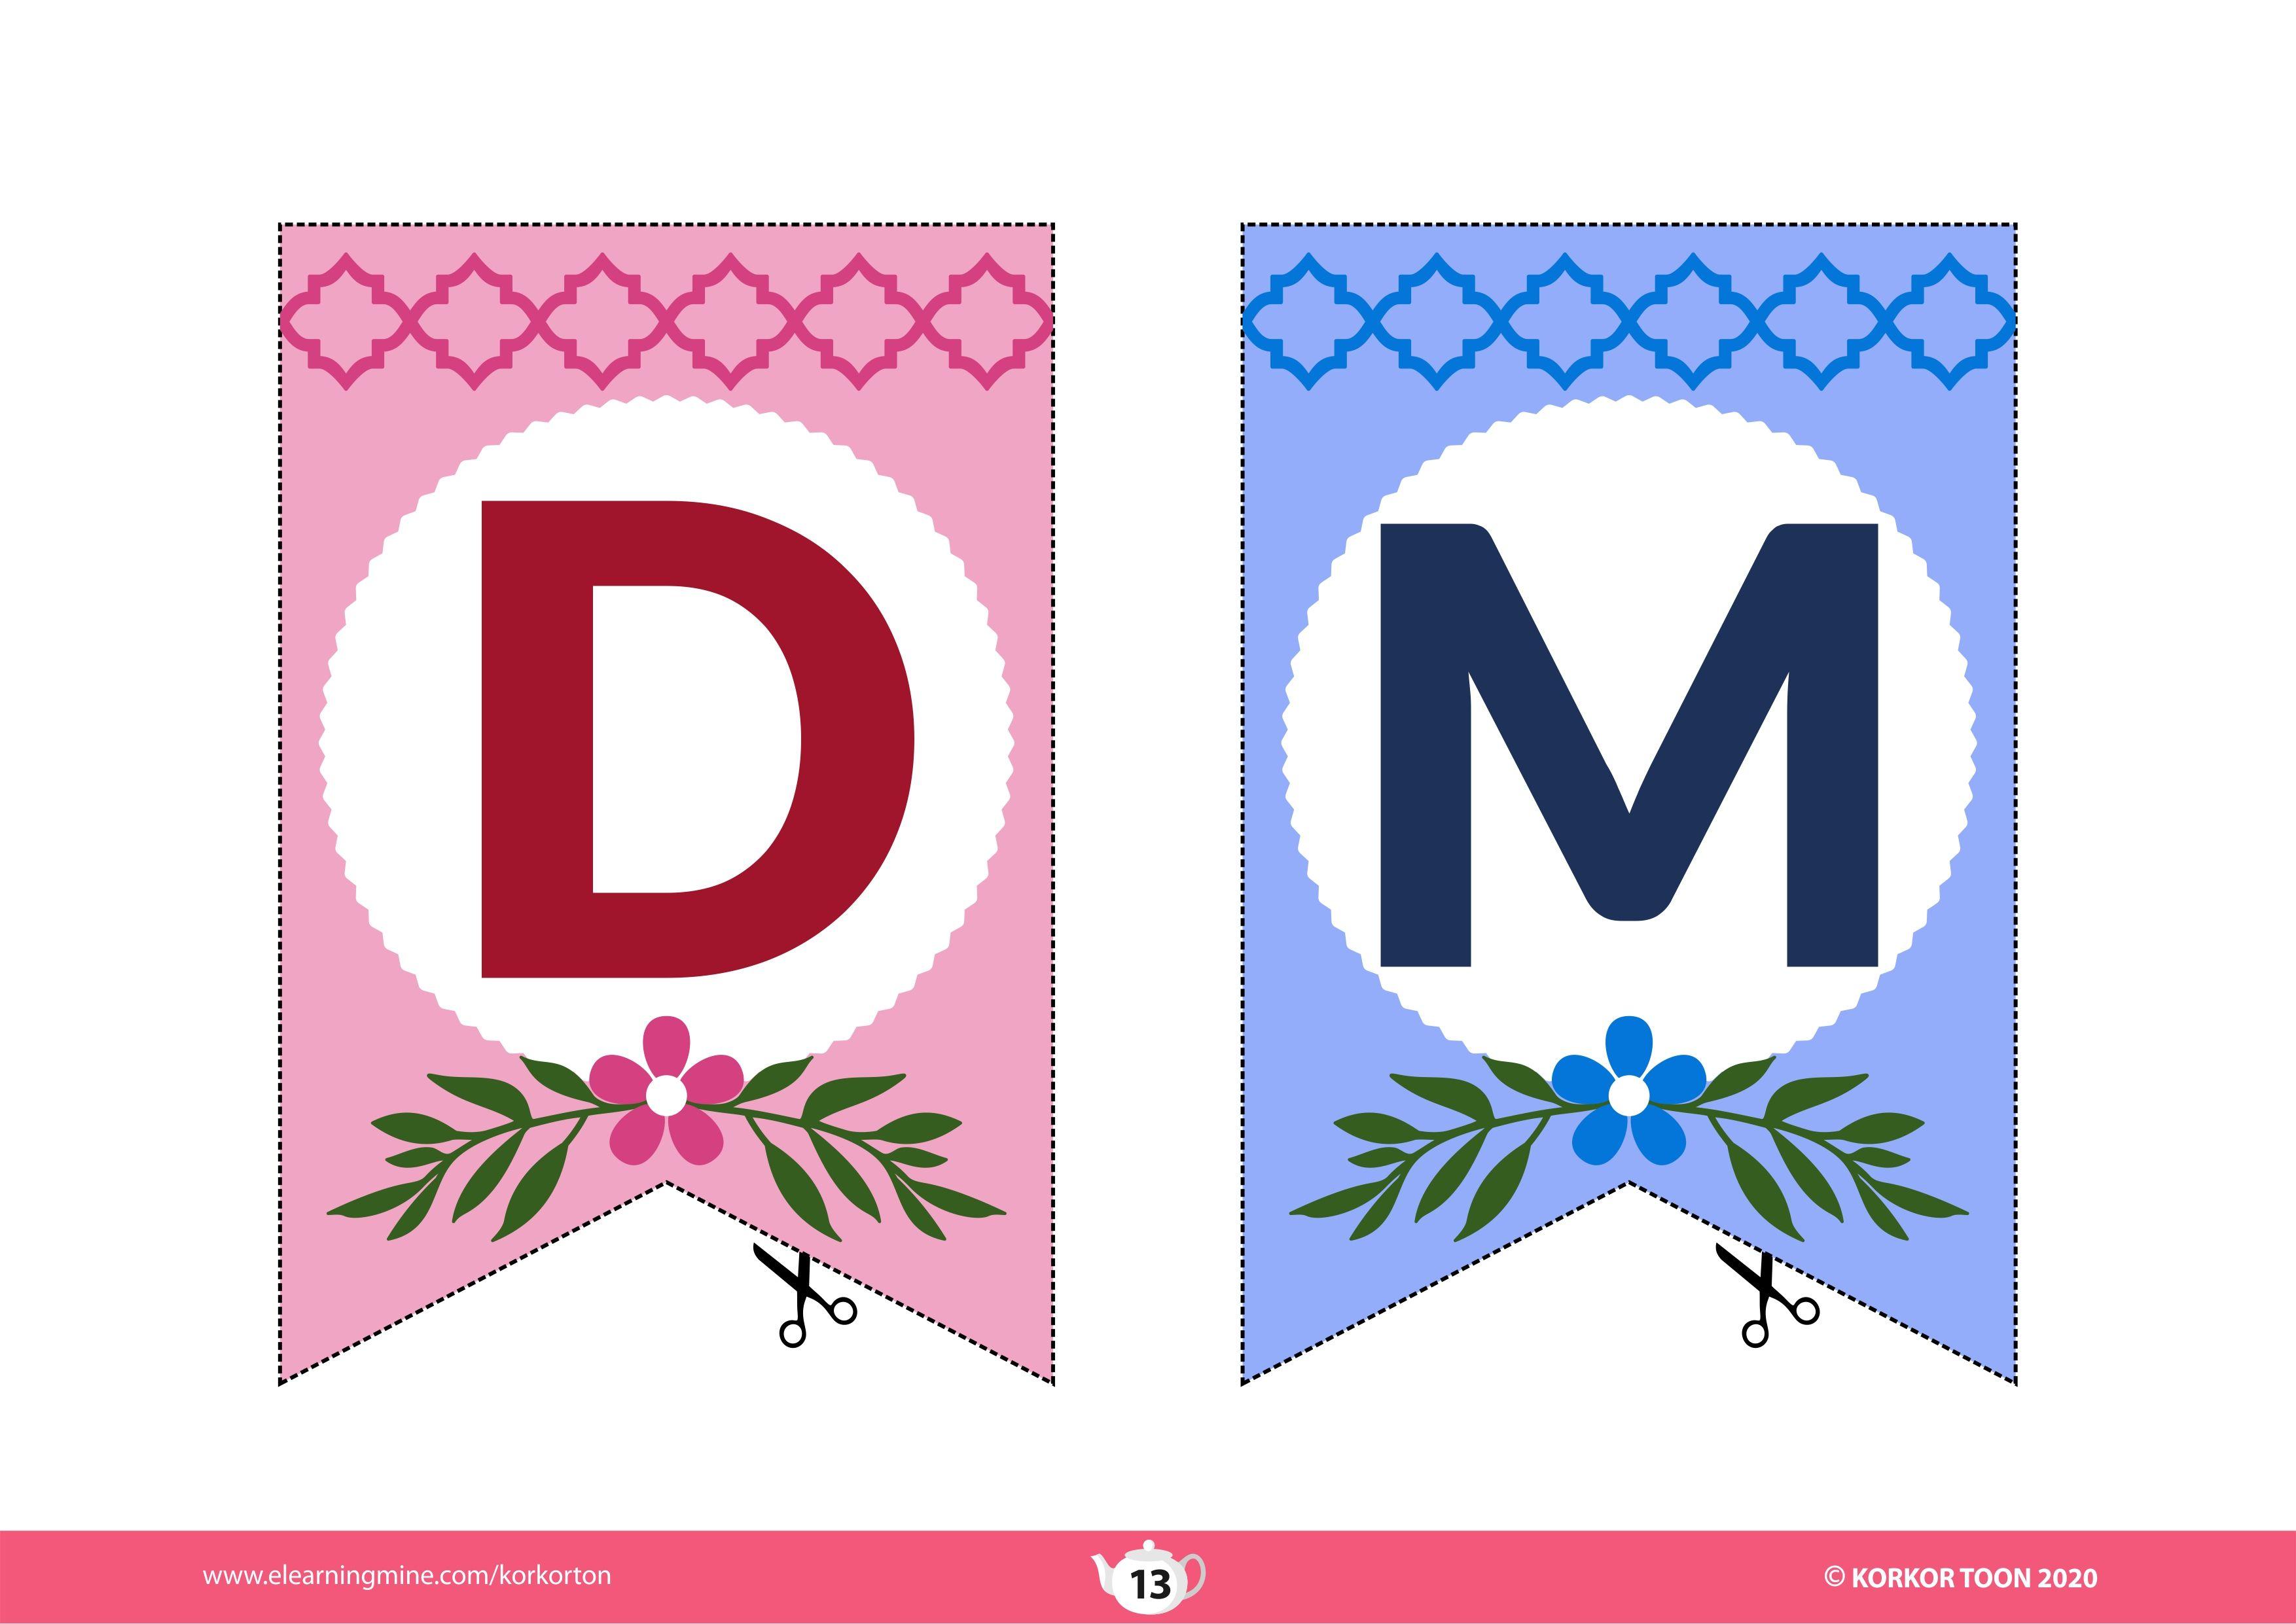 Printable Eid Decoration زينة العيد للطباعة Eid Decoration Decor Printables